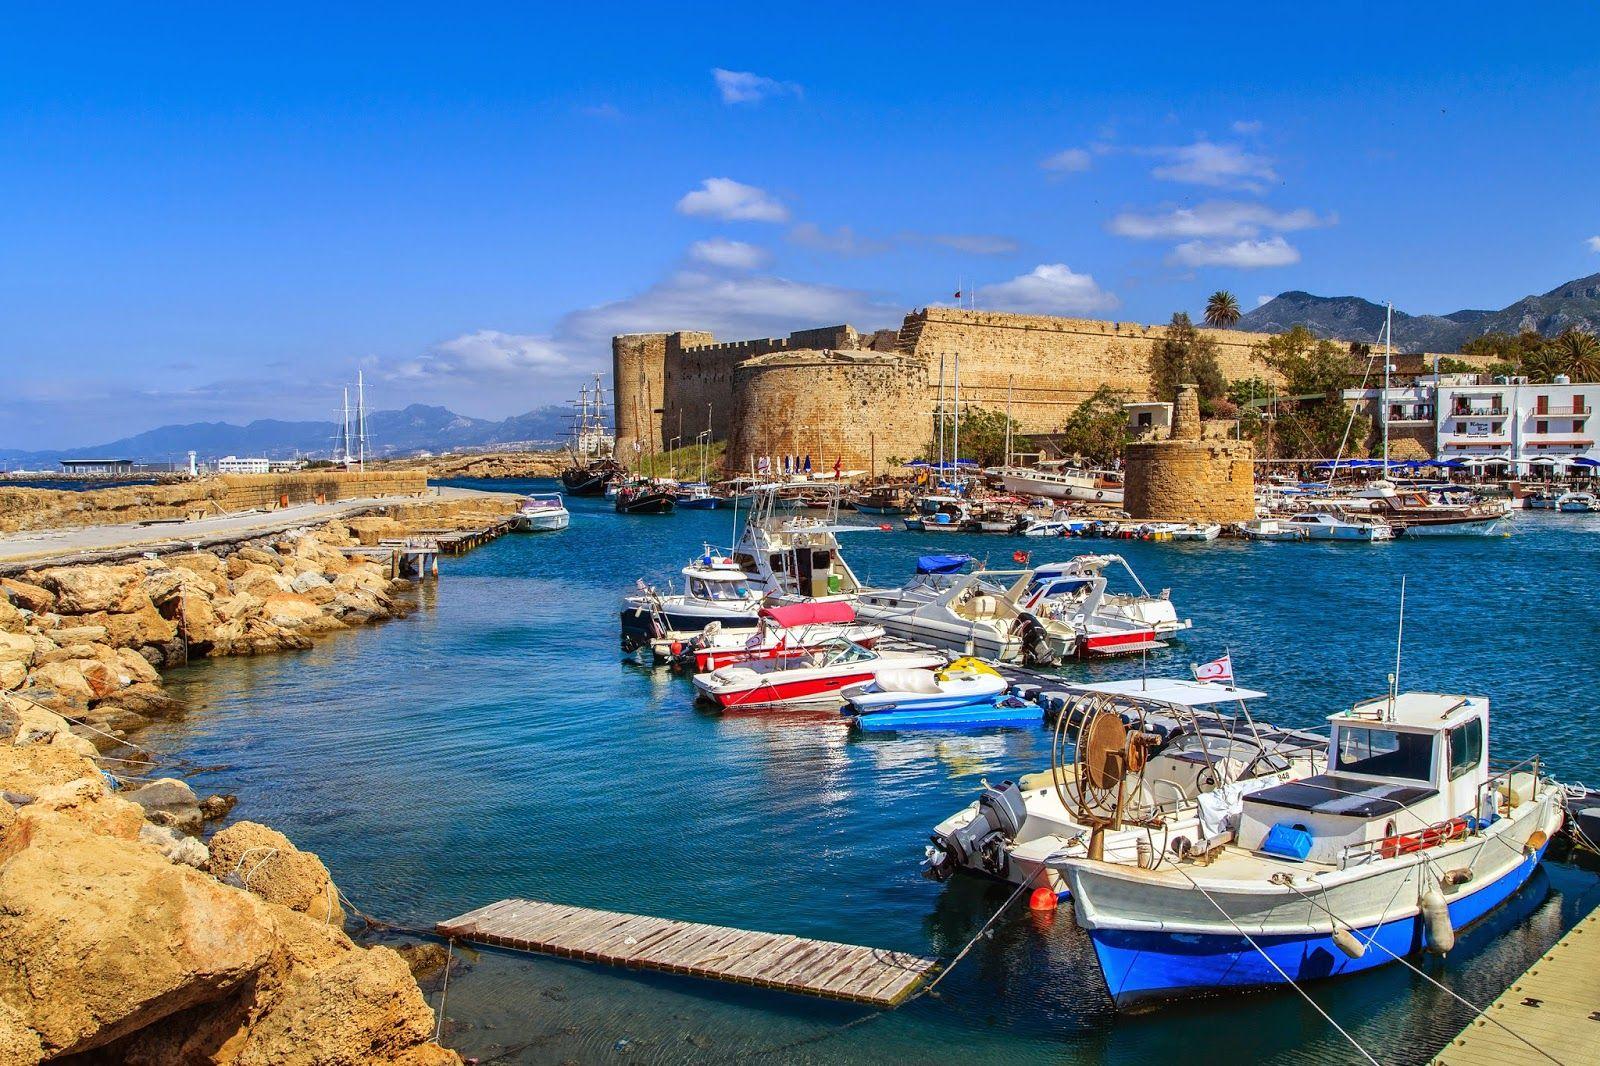 اهم الاماكن السياحية في قبرص اليونانية كل يوم معلومة Cool Places To Visit Tourist Attraction Europe Travel